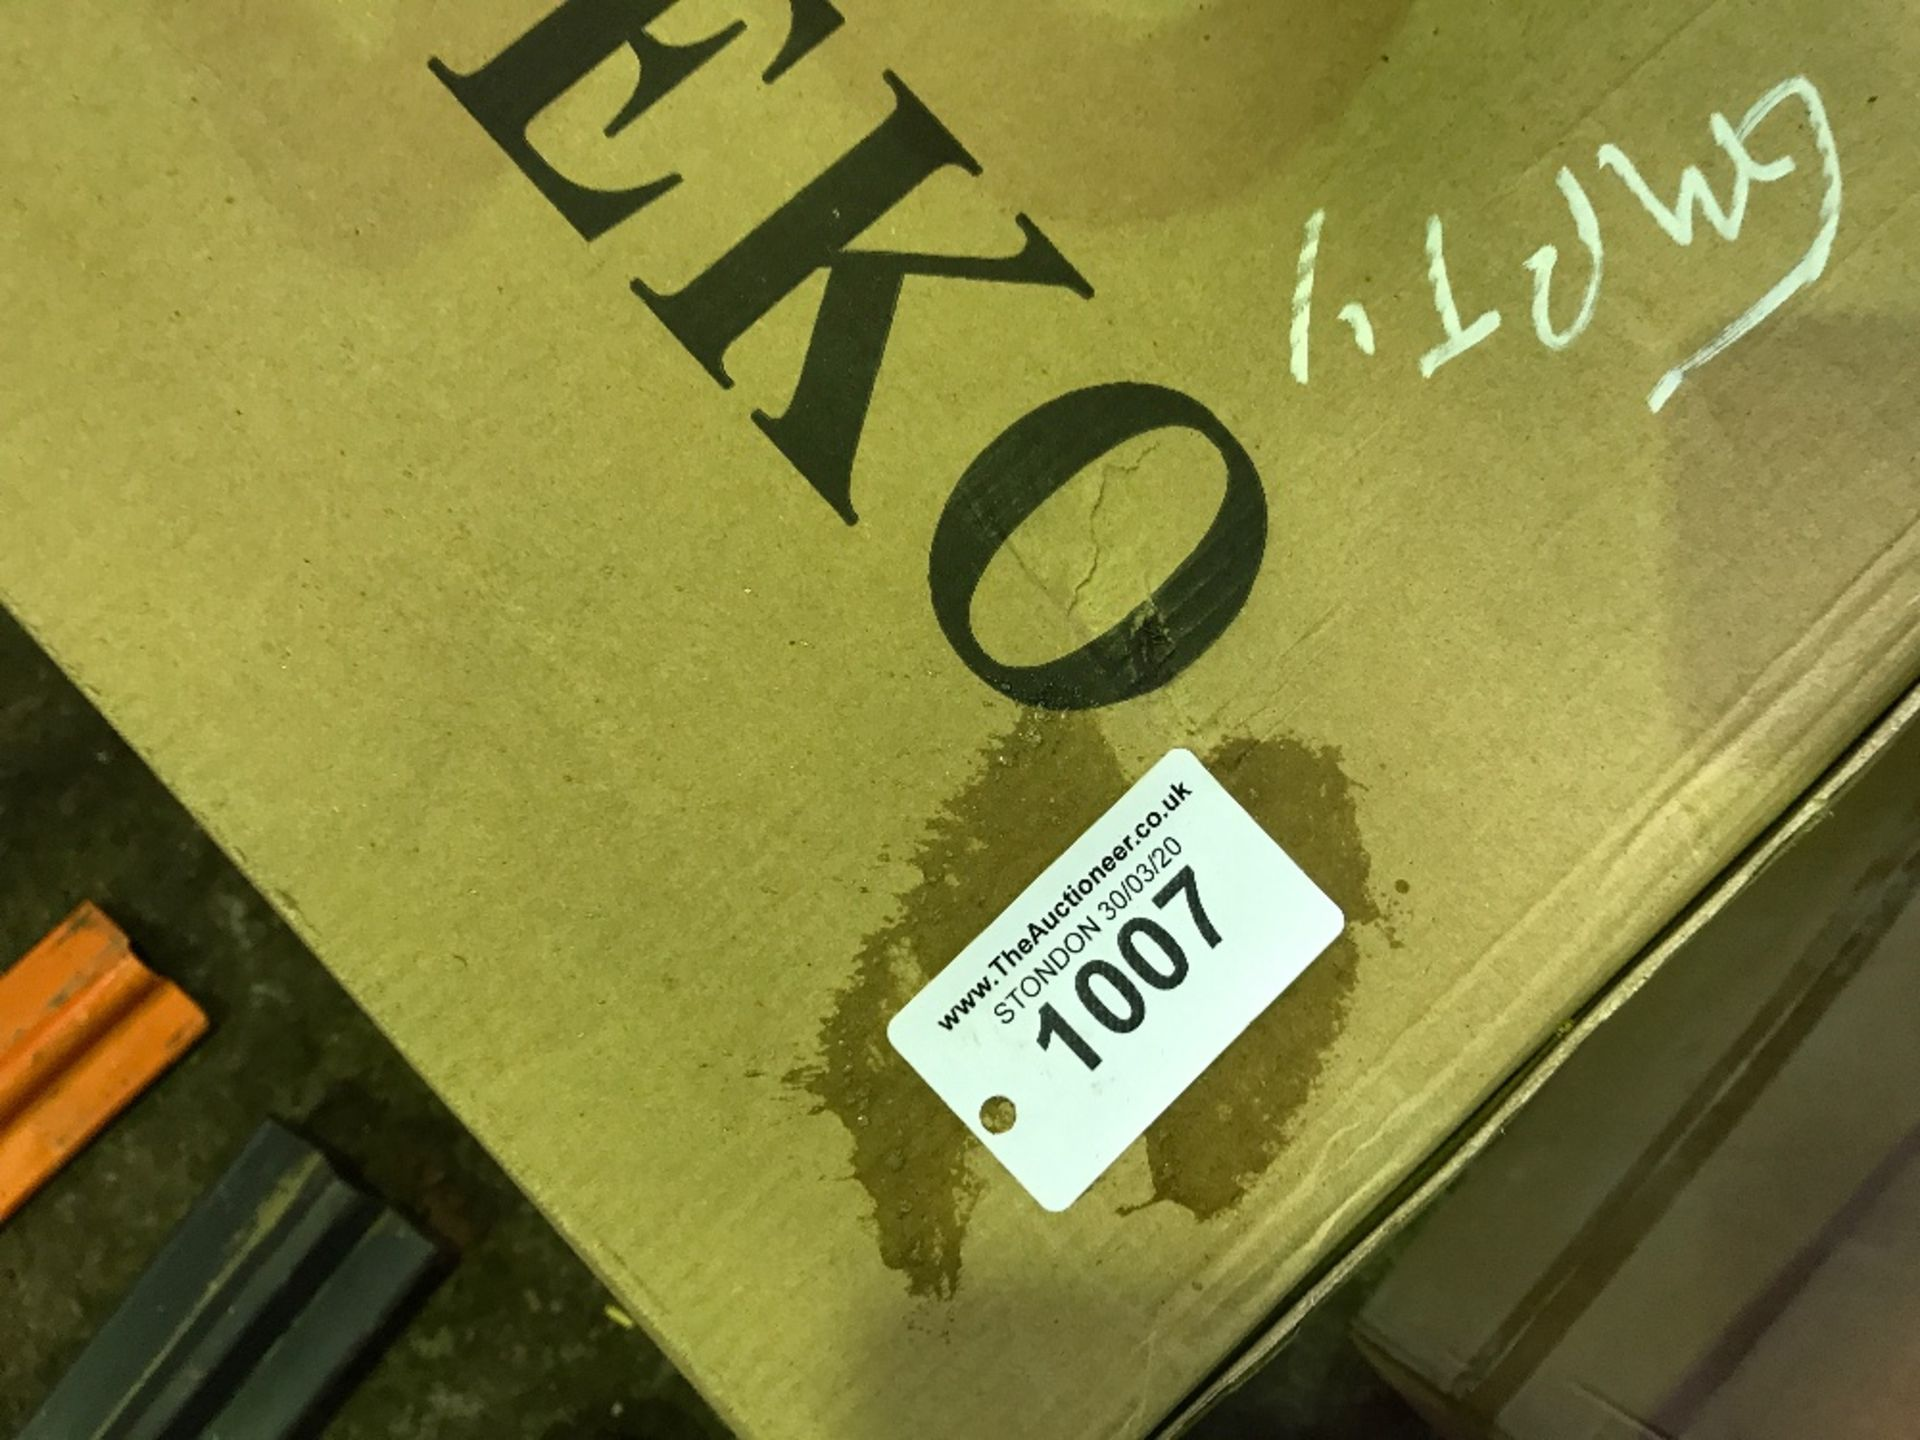 Lot 1007 - 4no. Deko petrol engined chainsaws, boxed